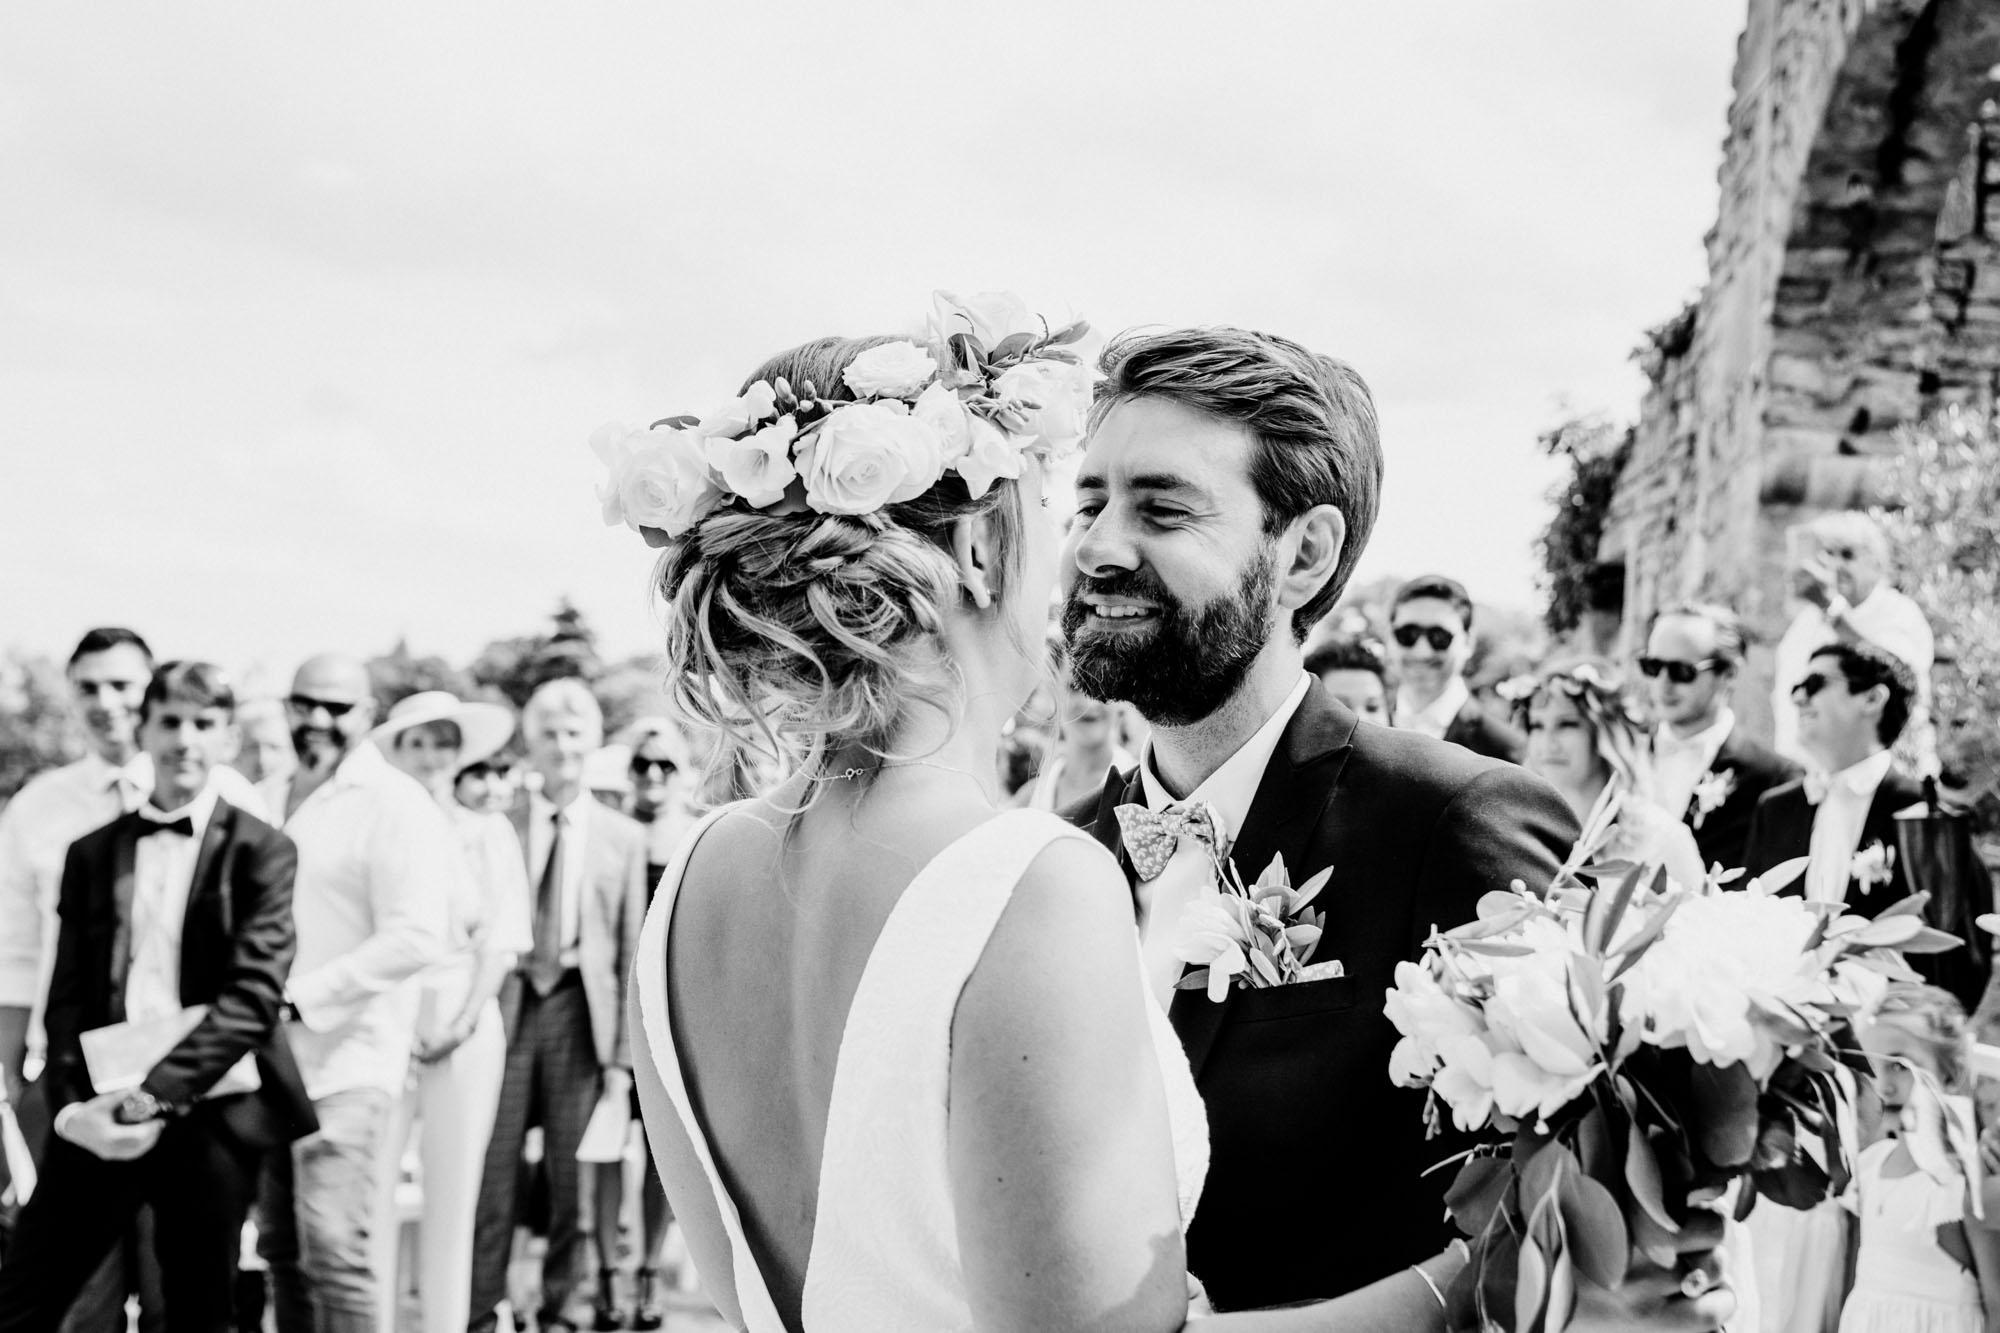 2018-07-21 - LD8_9758 - photographe mariage lyon - laurie diaz - www.lauriediazweeding.com.jpg